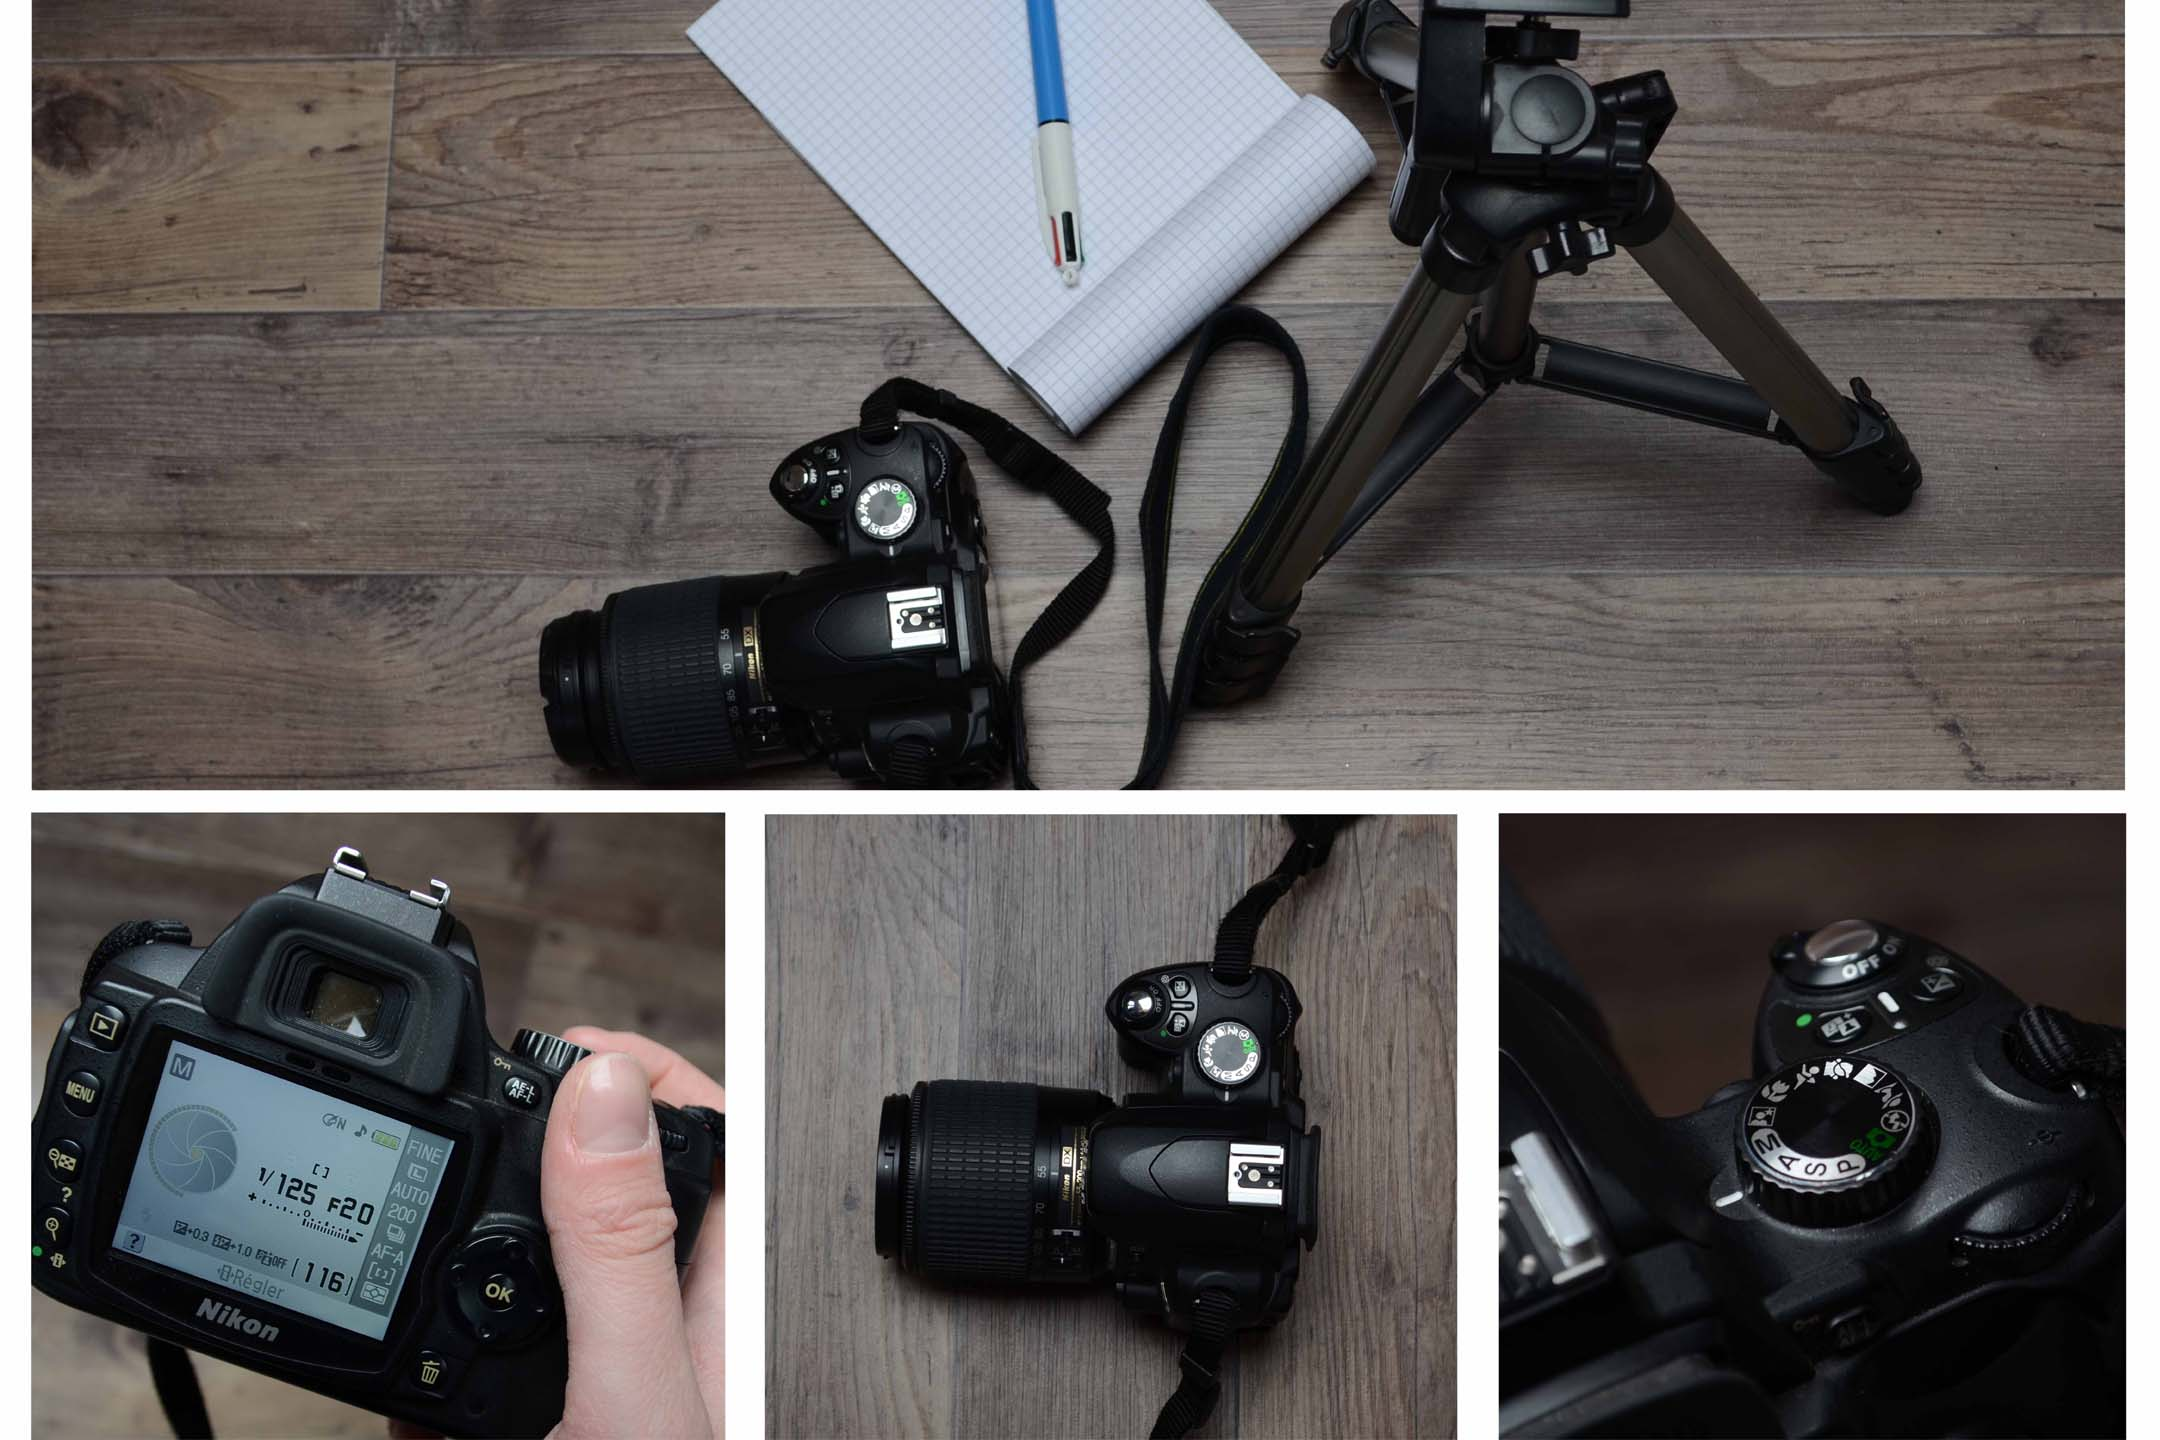 Formation photographie : Pour booster vos talents